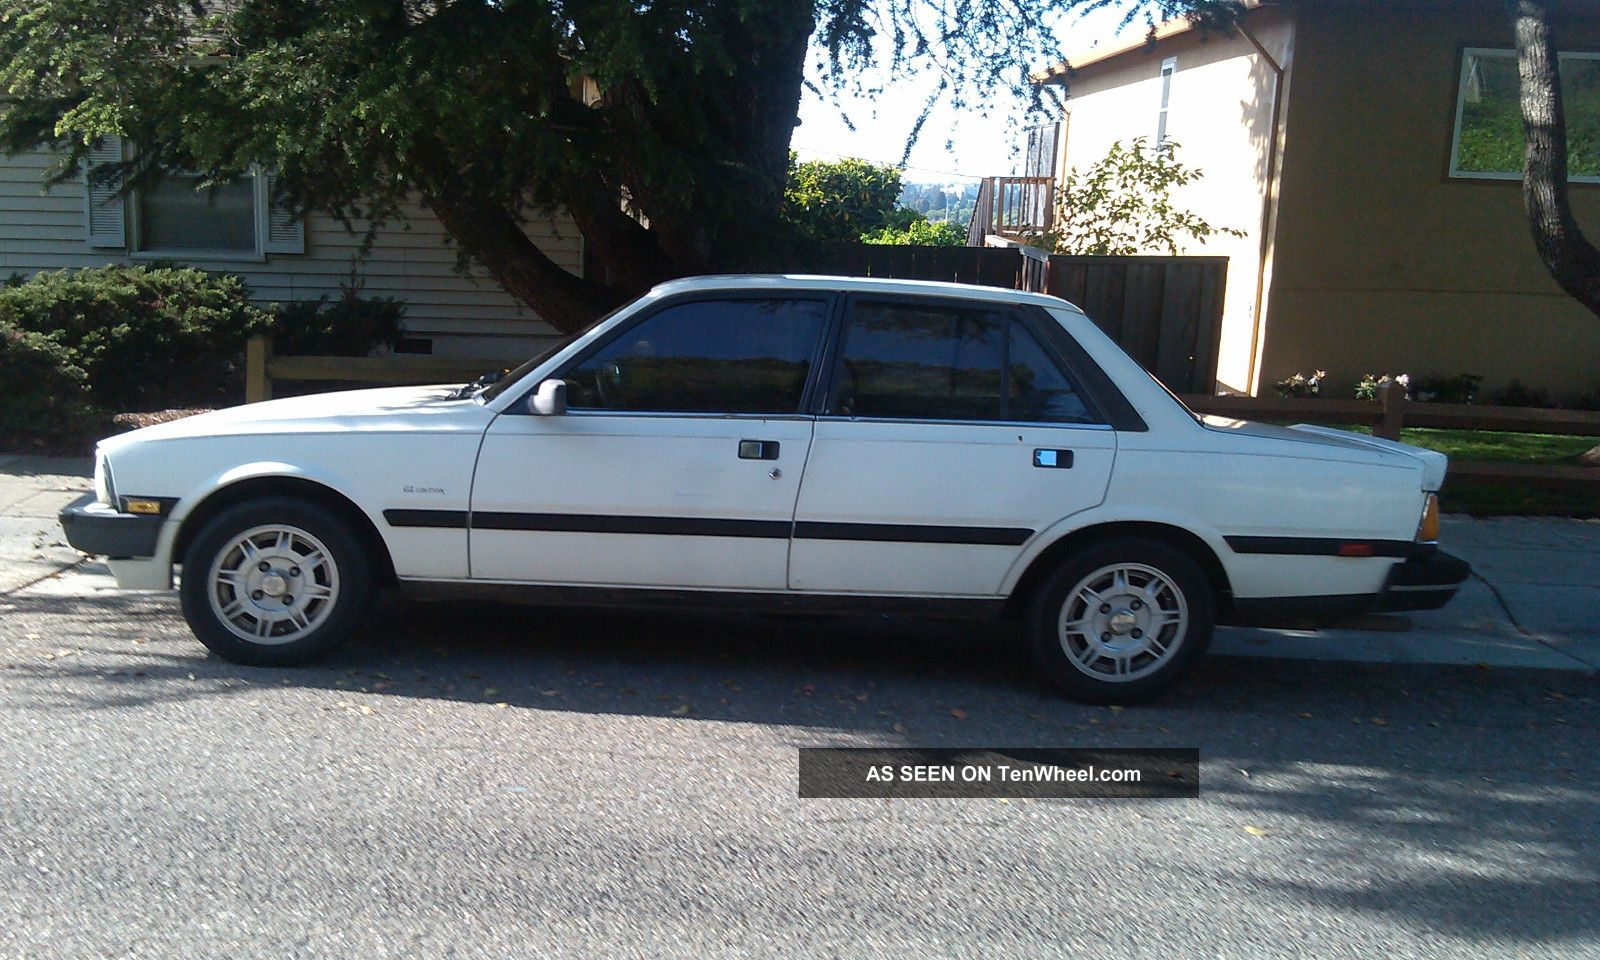 rare 1986 peugeot 505 s turbo 2 2l sport sedan rblt engine runs drives well. Black Bedroom Furniture Sets. Home Design Ideas